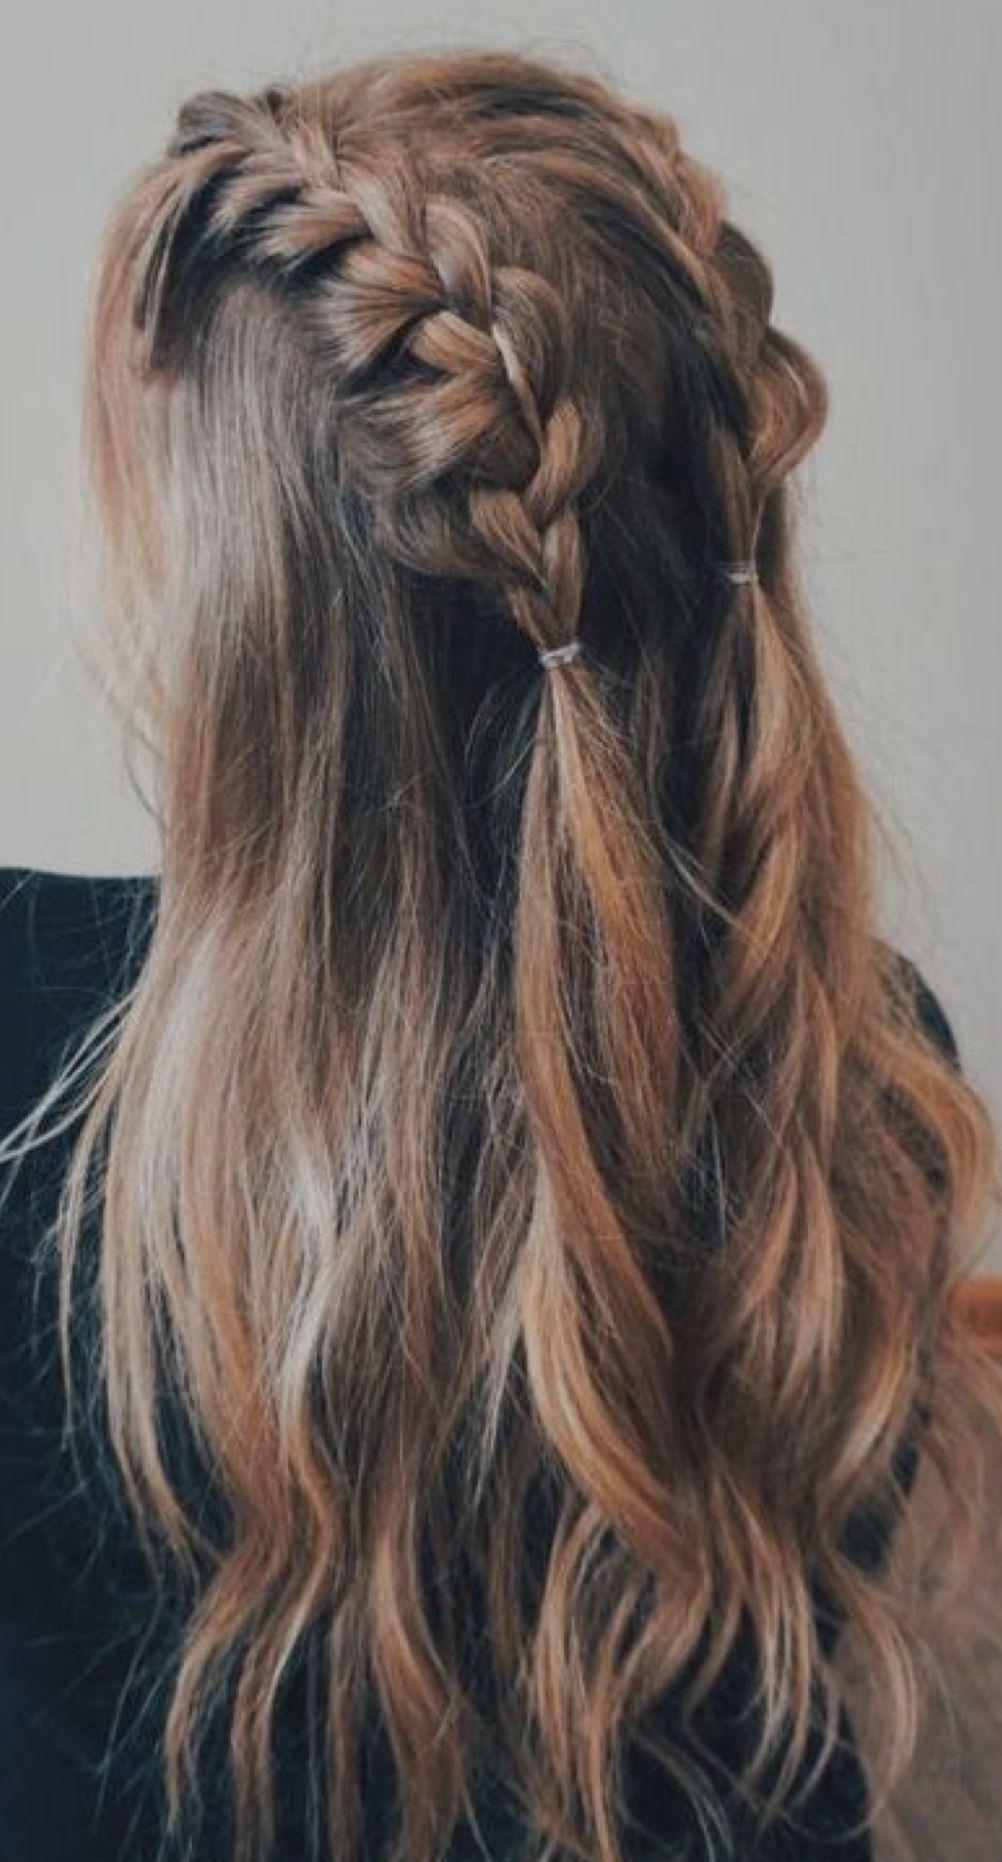 Rien Que Lui In 2020 Cool Braid Hairstyles Hair Styles Braided Hairstyles